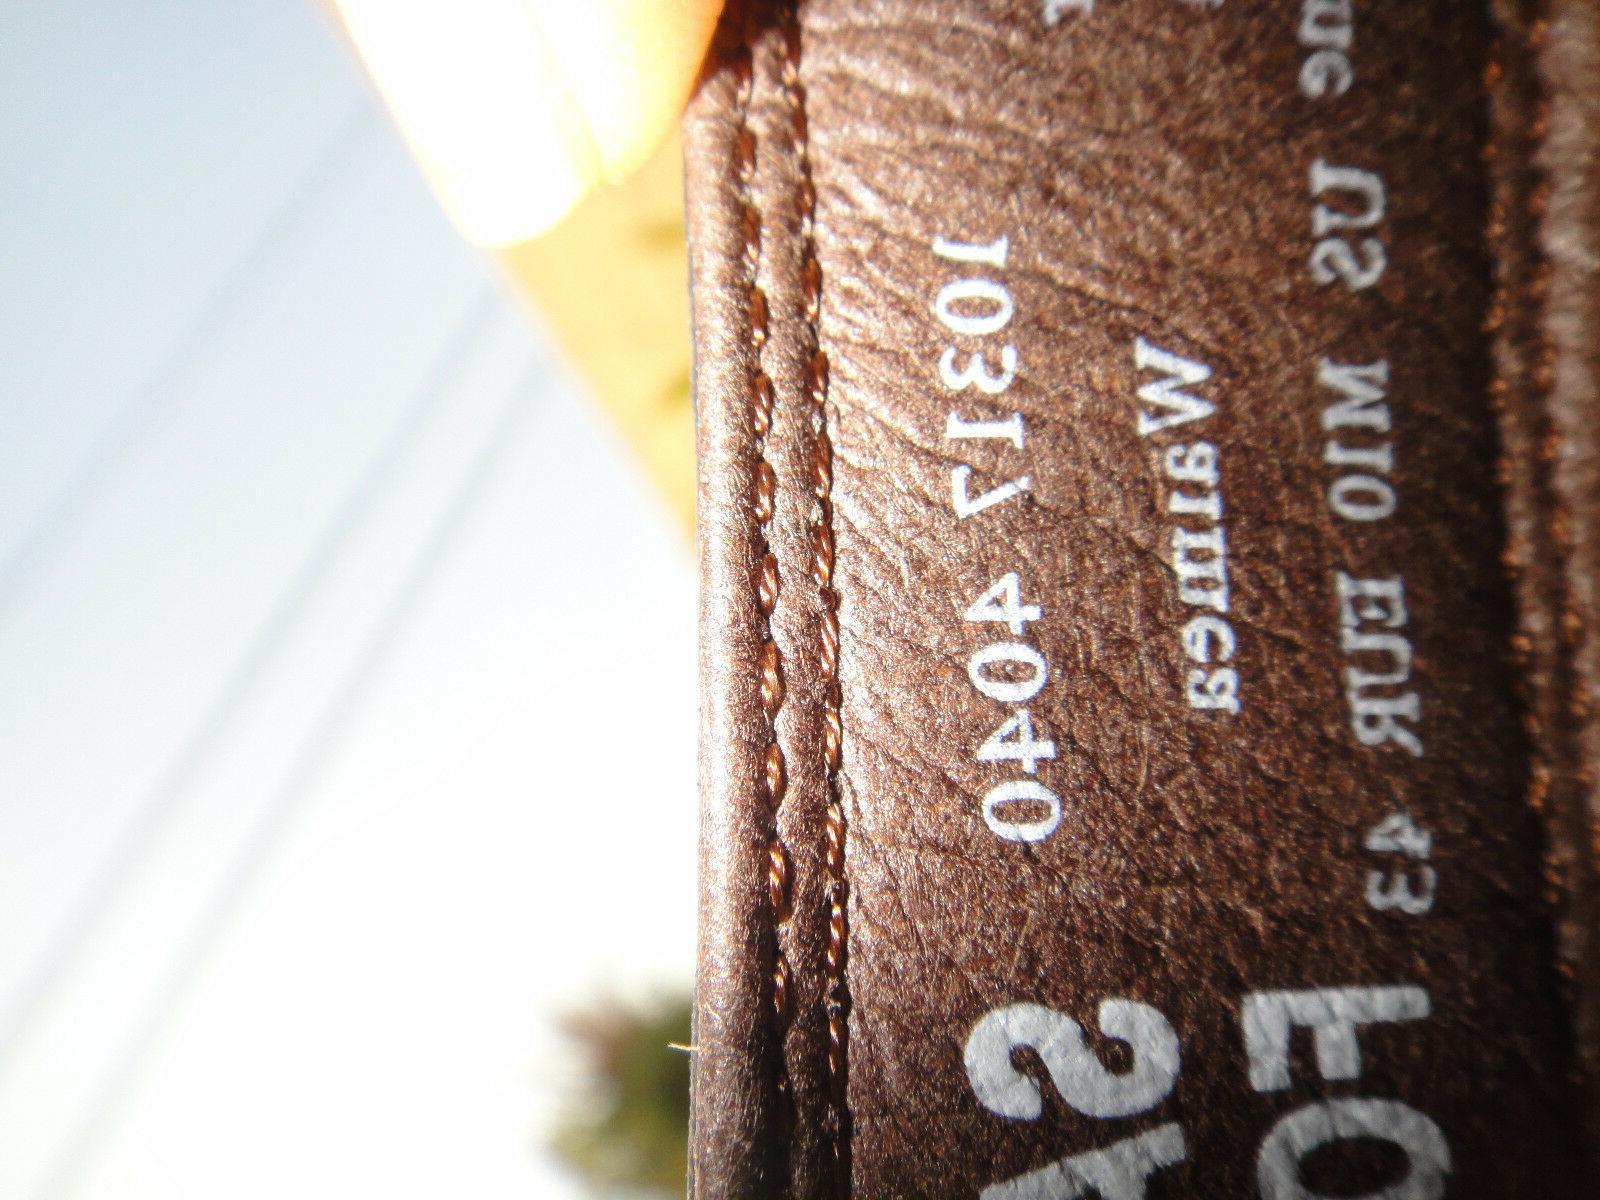 OluKai Stitched Sole, 10M